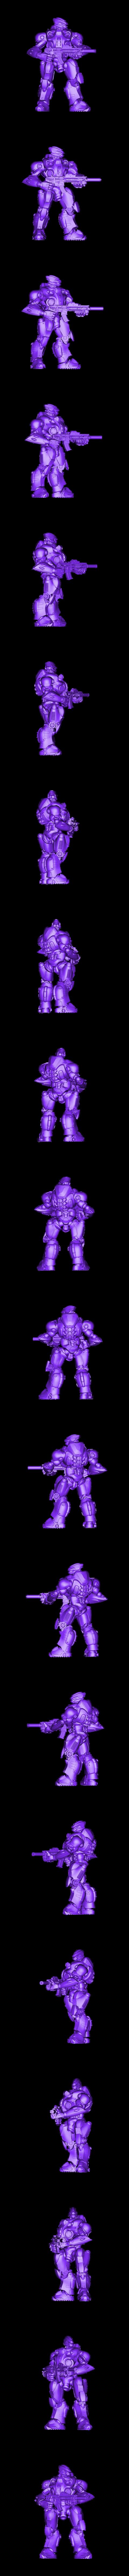 Mecha1.stl Download free STL file Mecha x2 • 3D print model, duncanshadow